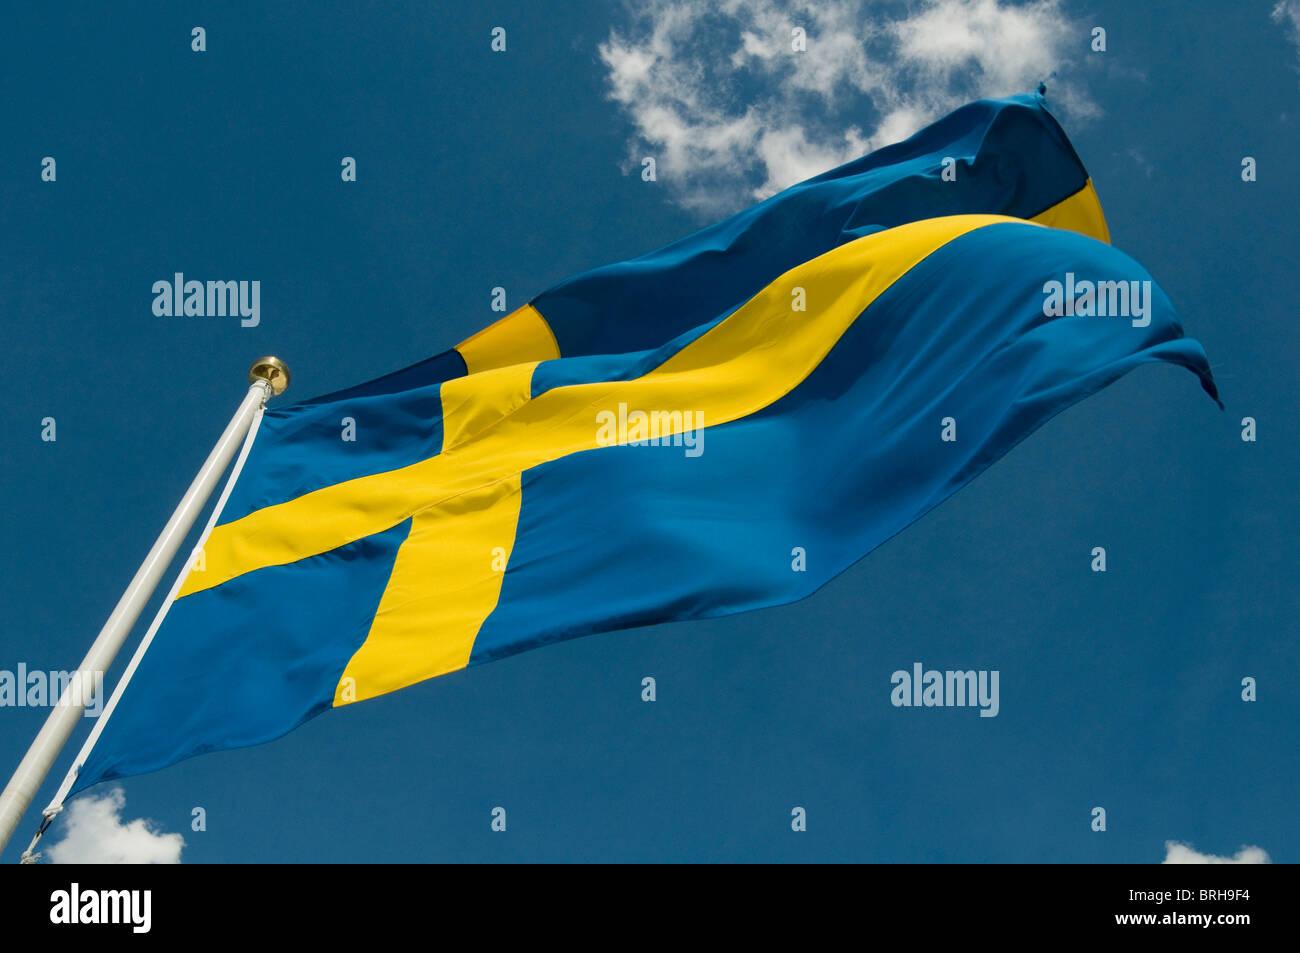 swedish flag sweden flags pole poles flagpole flagpoles flutter fluttering national pride symbol nationality - Stock Image